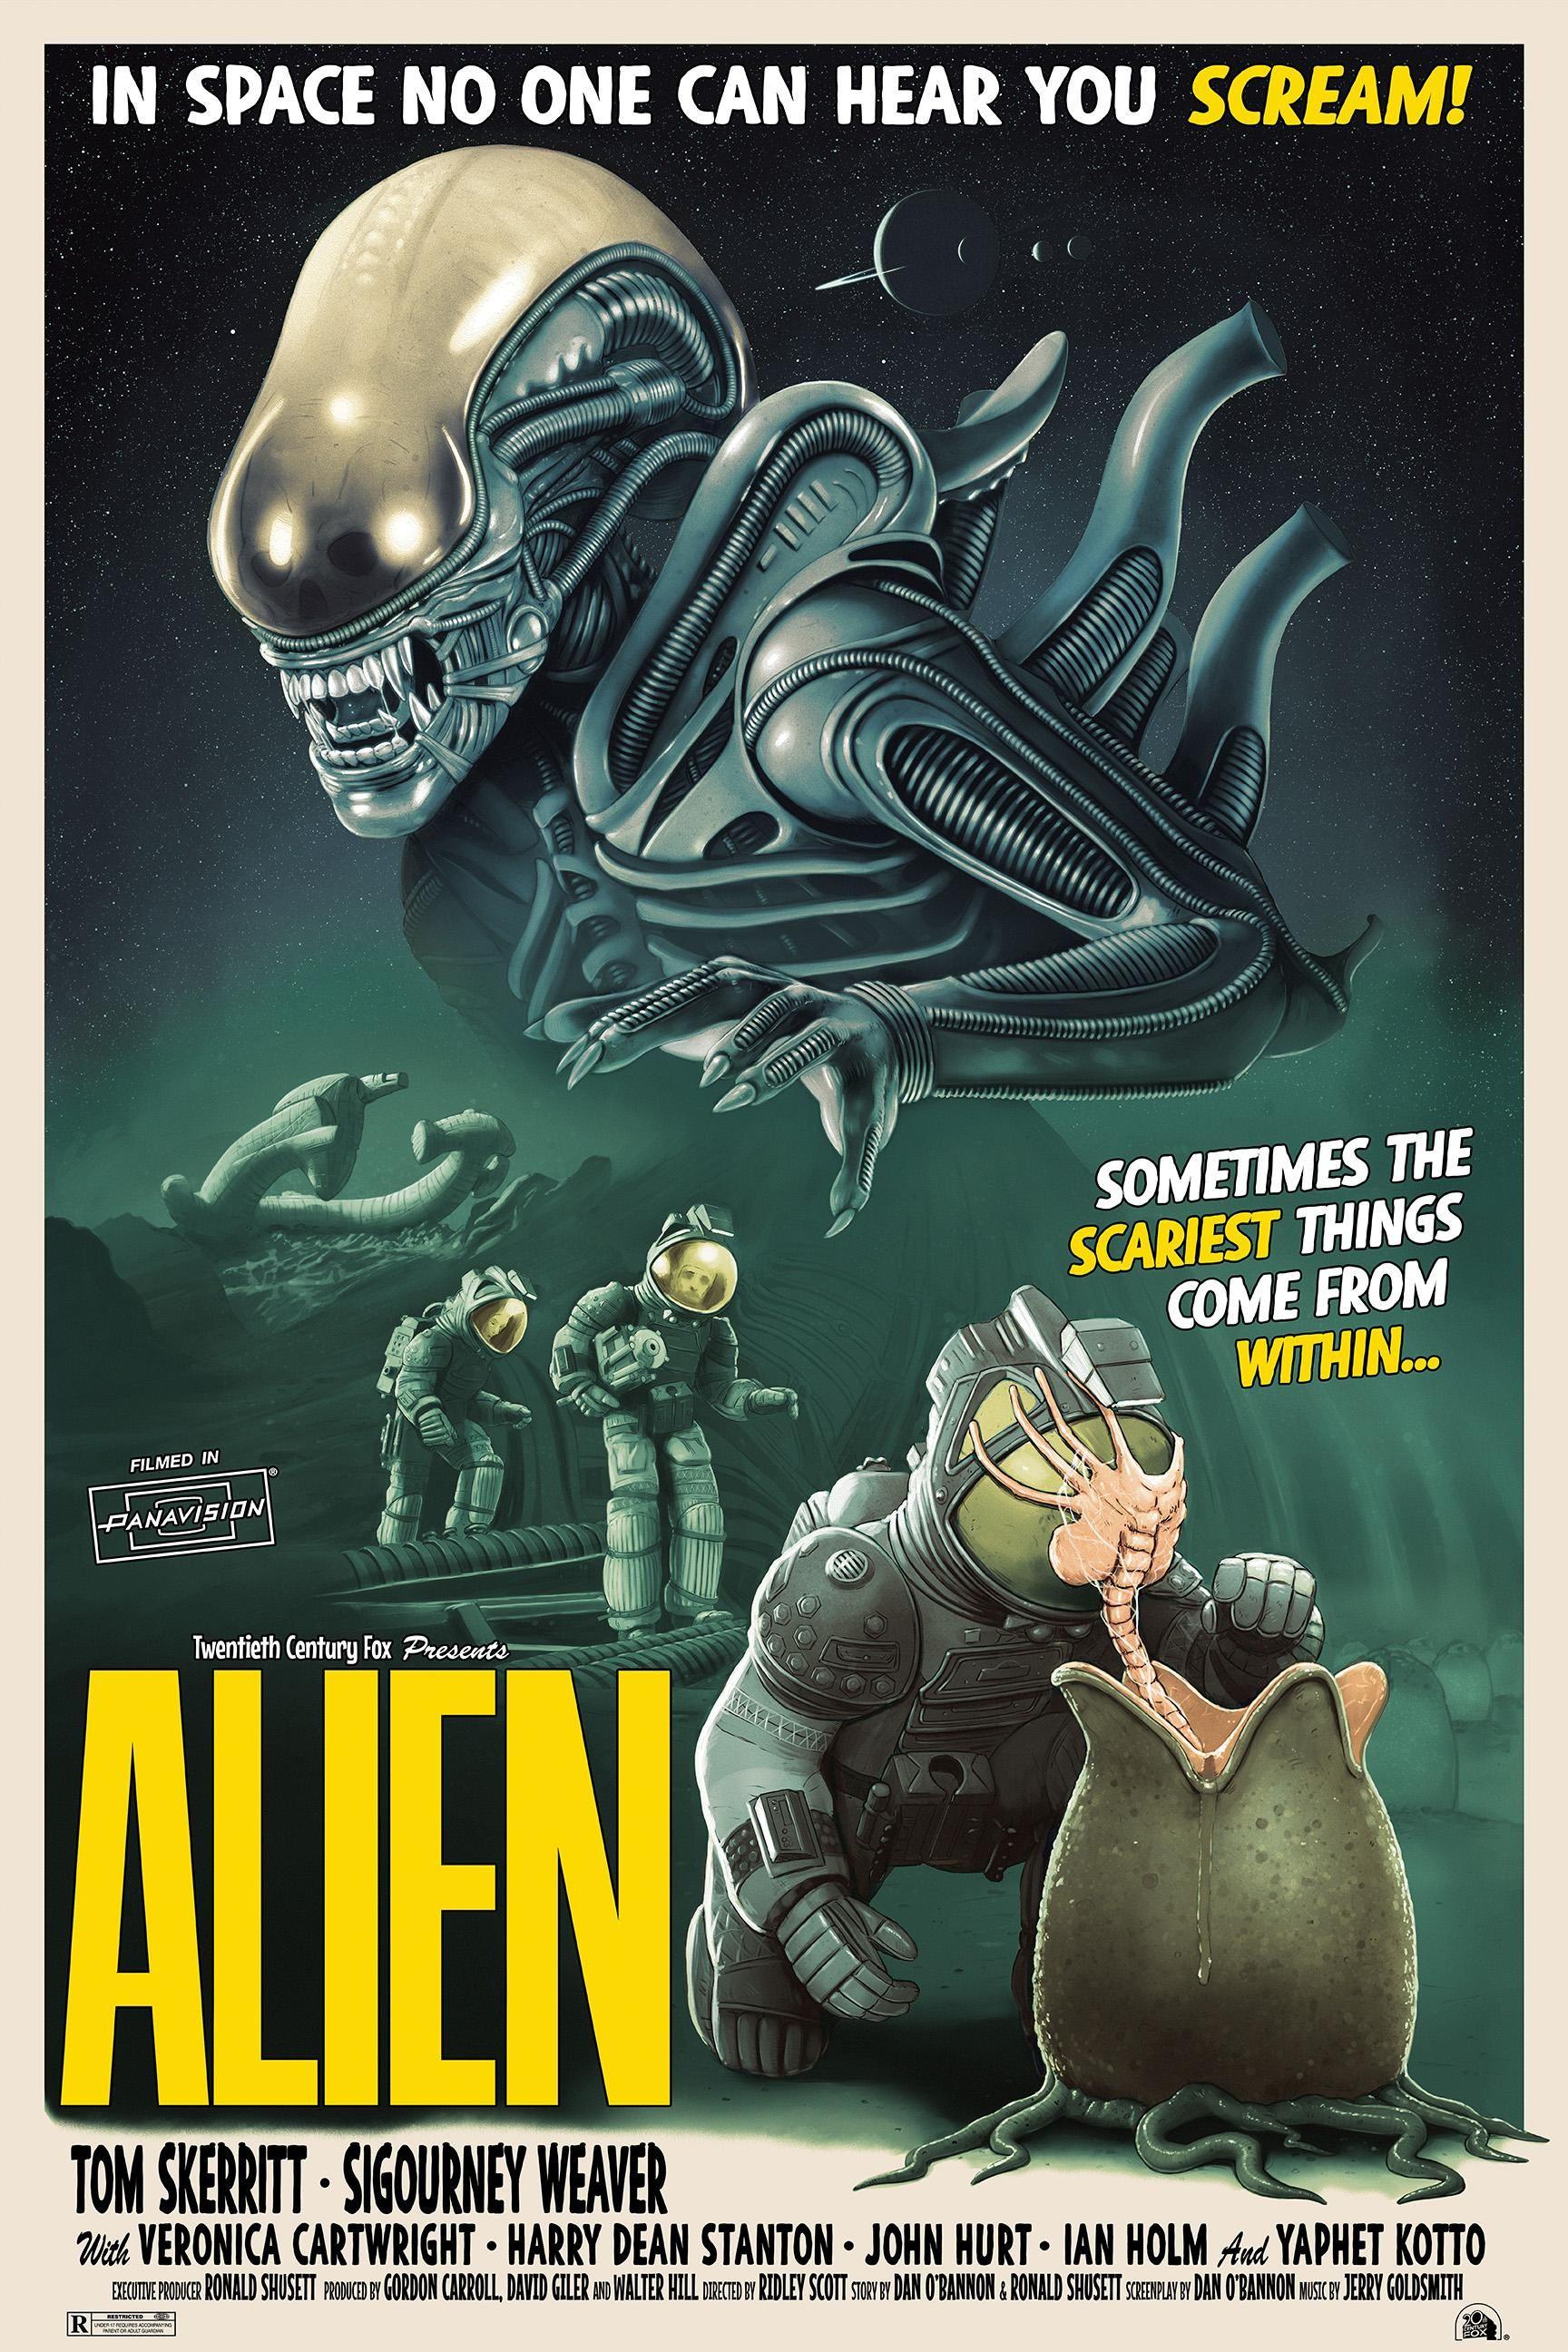 Alien 1971 600 X 800 By Tom Walker Alien Movie Poster Horror Prints Movie Posters